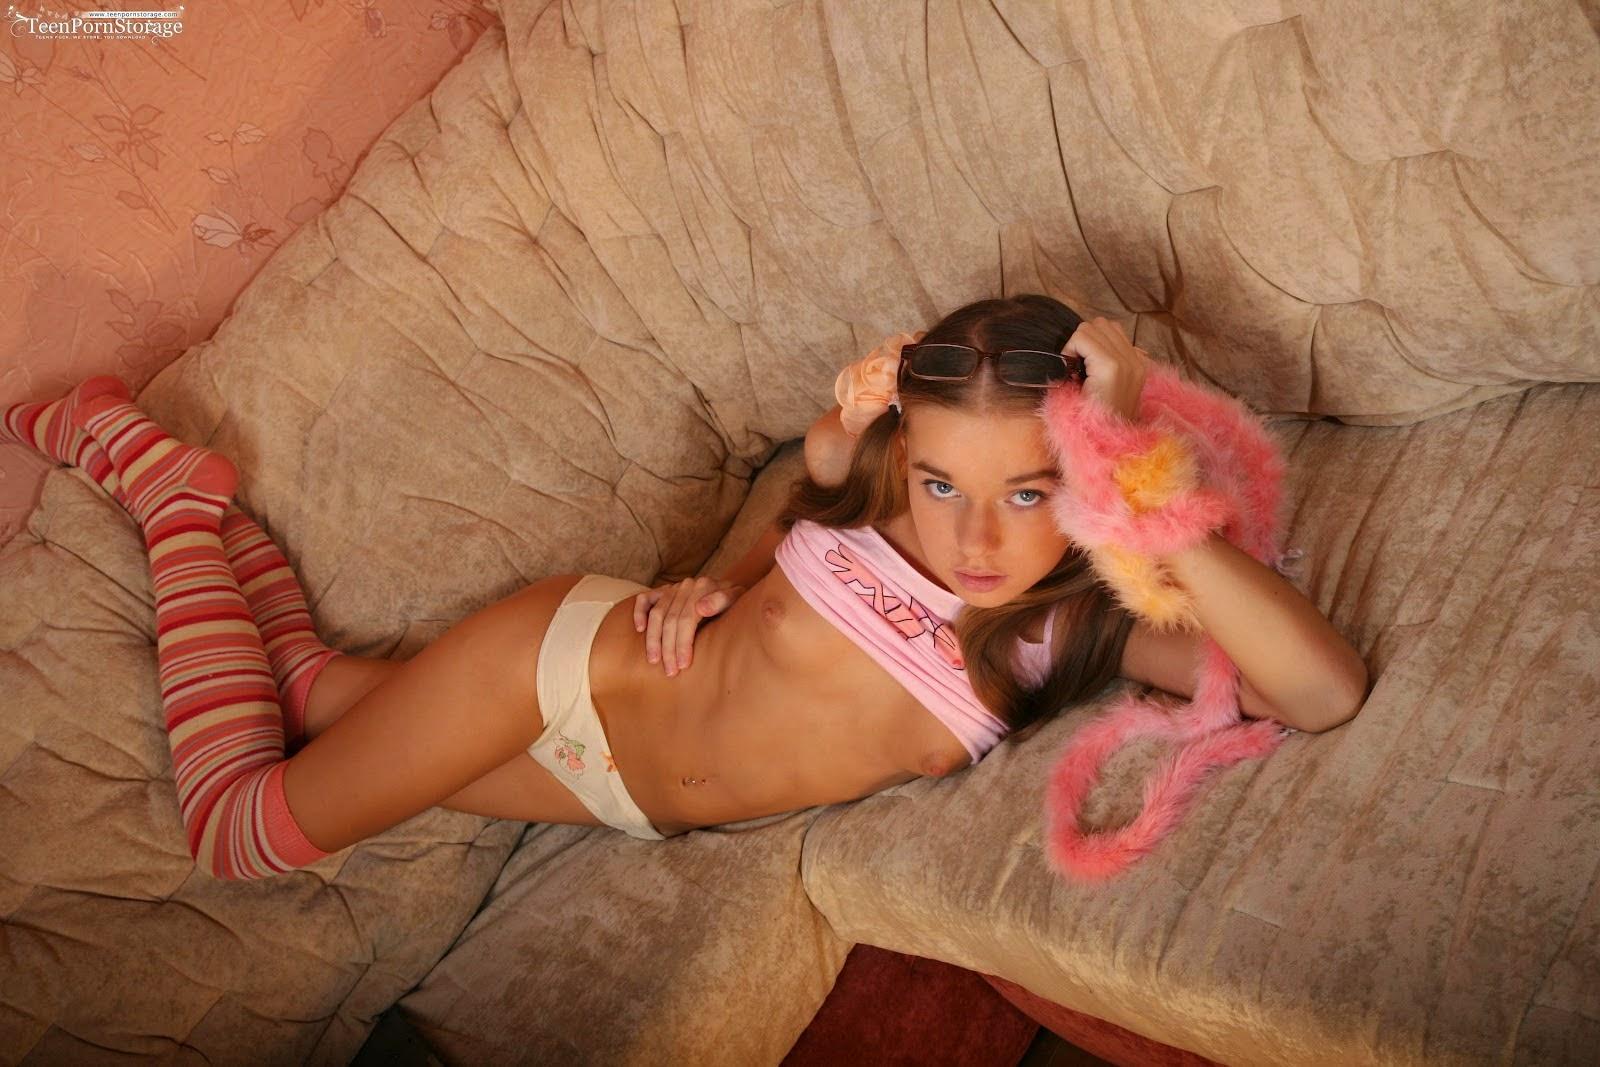 tranny-pics-hot-girl-teens-sleeping-naked-deep